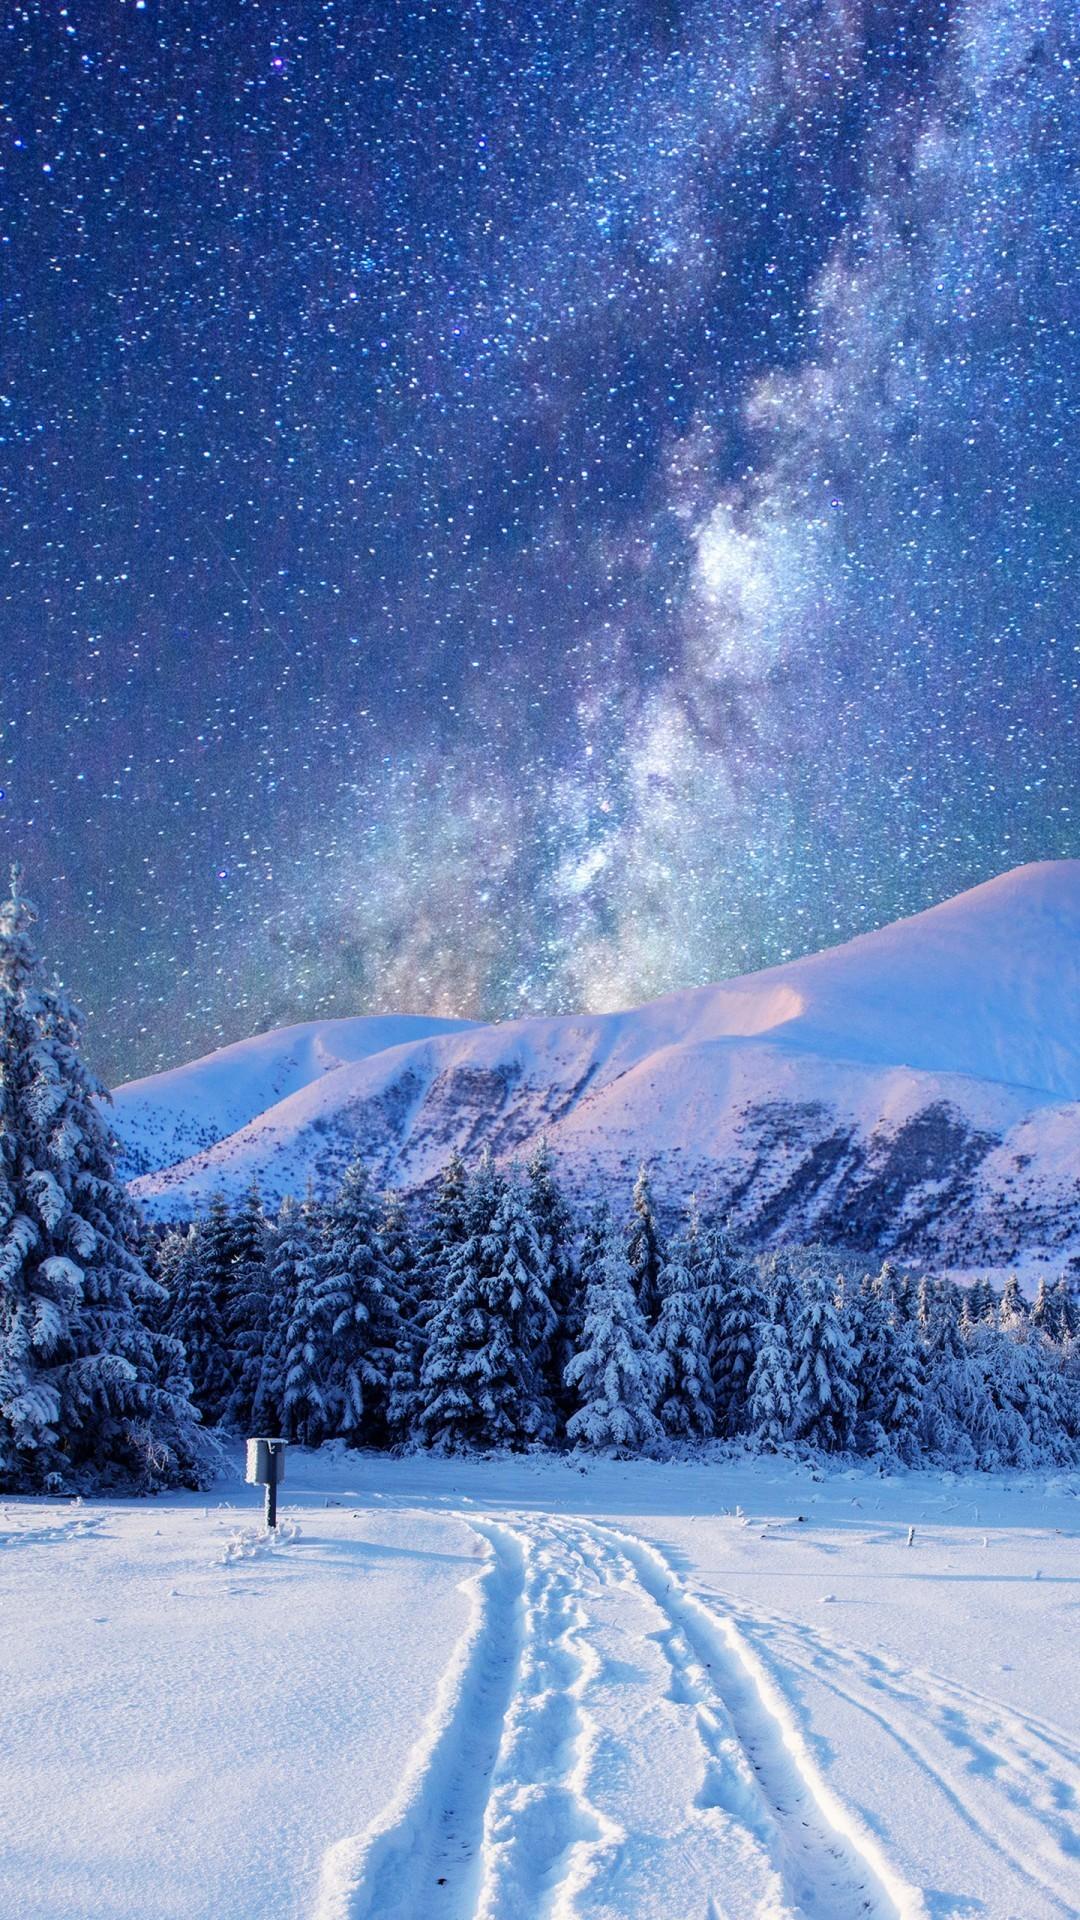 Winter night. iPhone 7. Download 0